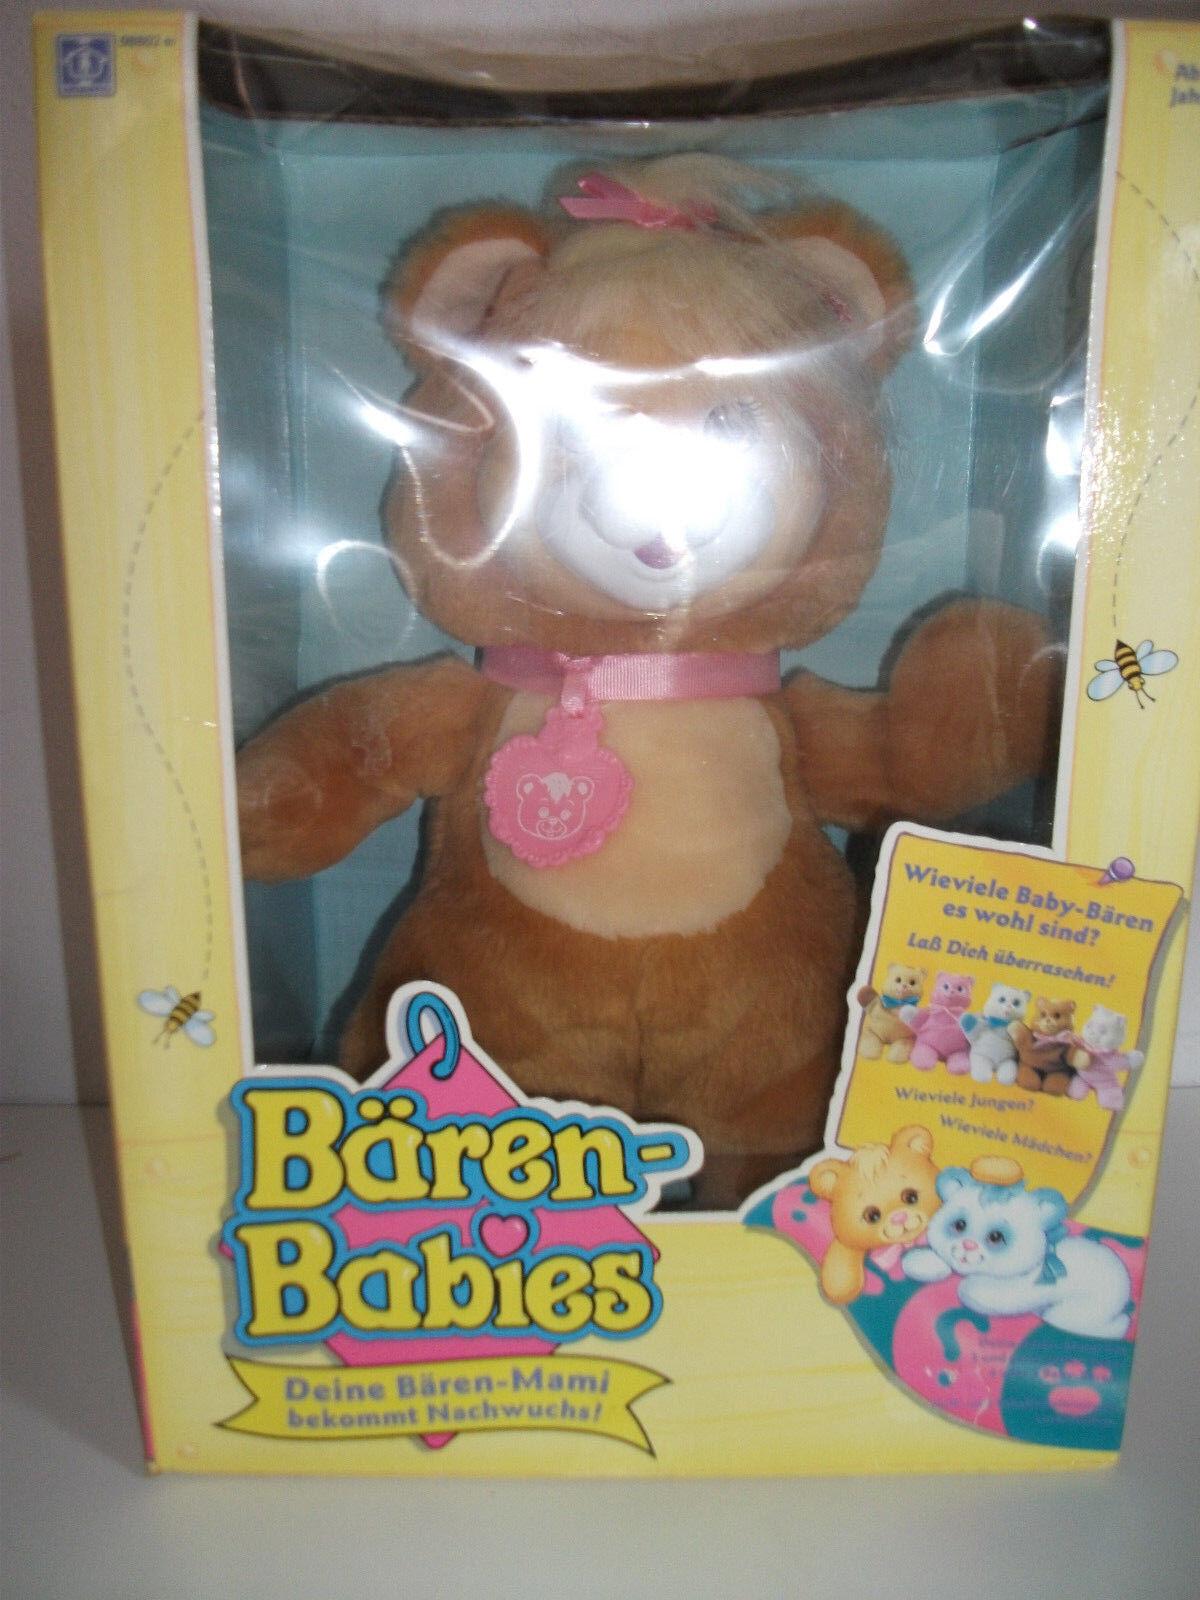 Orig.Bären Babies -Bären Mami (32cm) bekommt 5 X X X Nachwuchs  -OVP 54cdc5